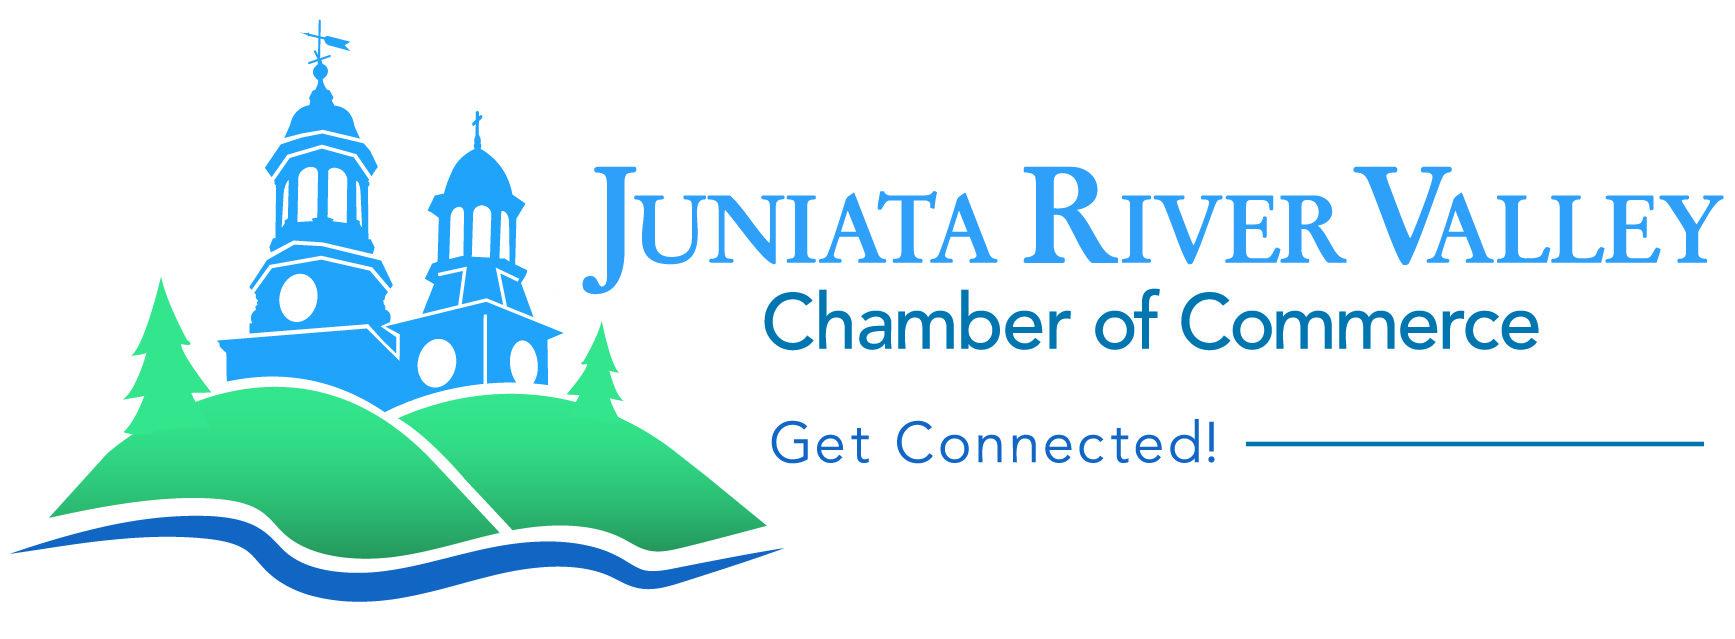 Juniata River Valley Chamber of Commerce